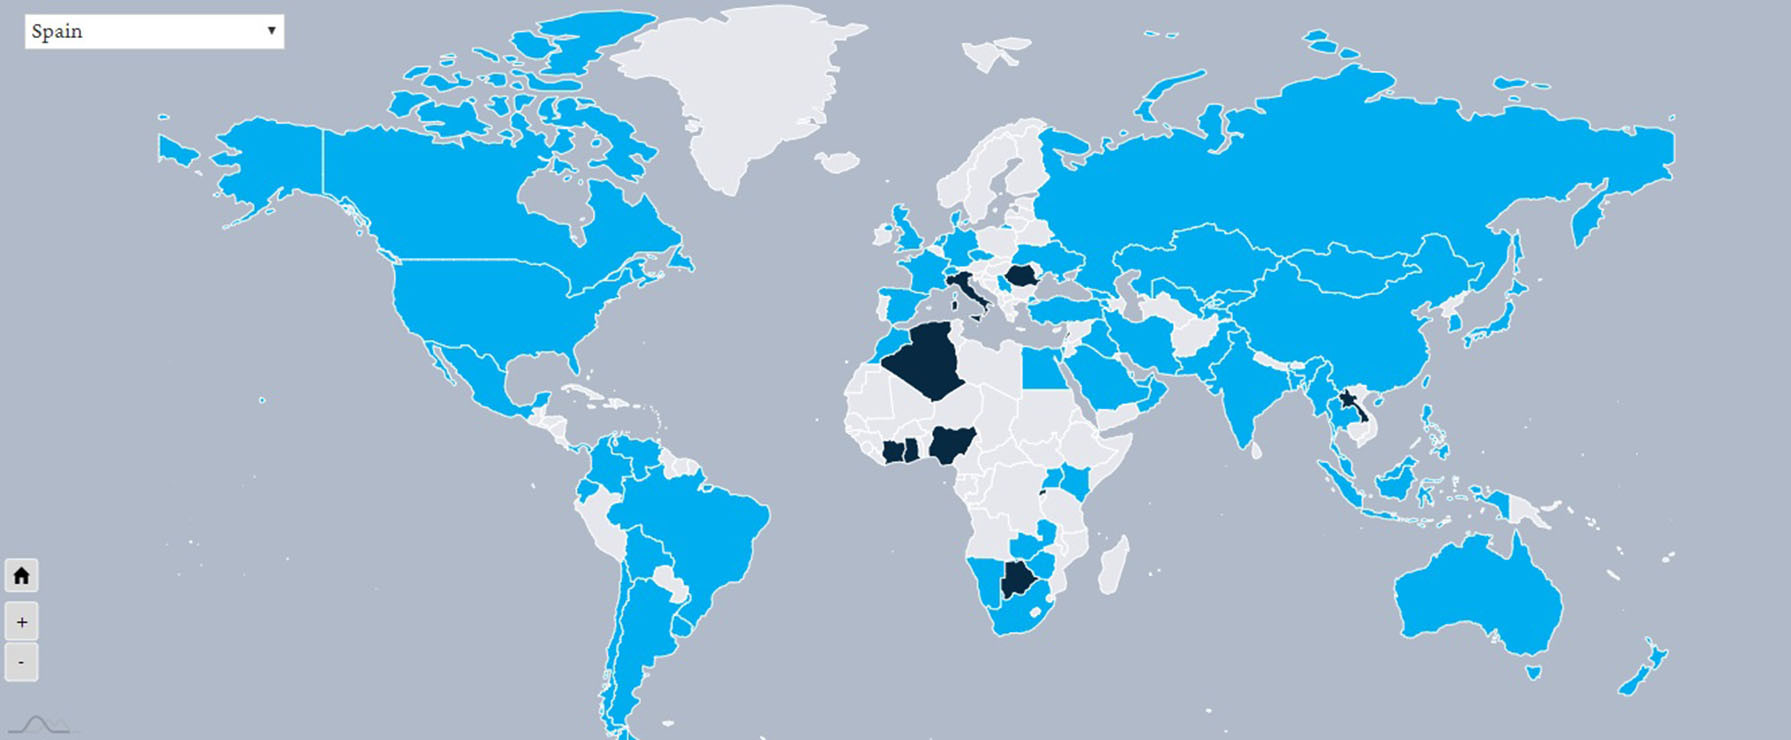 paises con ciudades tecnologia biometrica